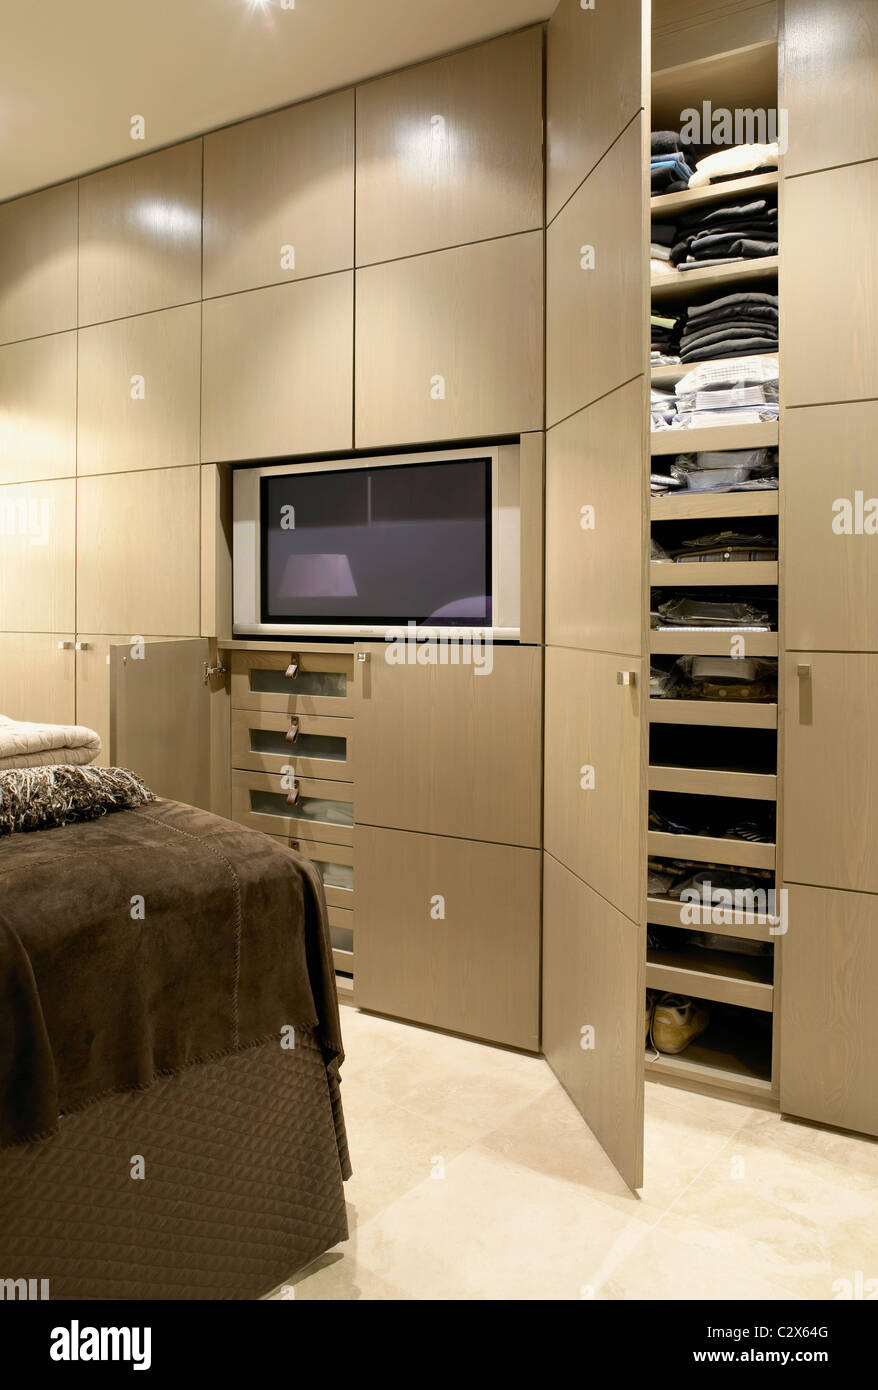 Michael Reeves designer interiors - Stock Image